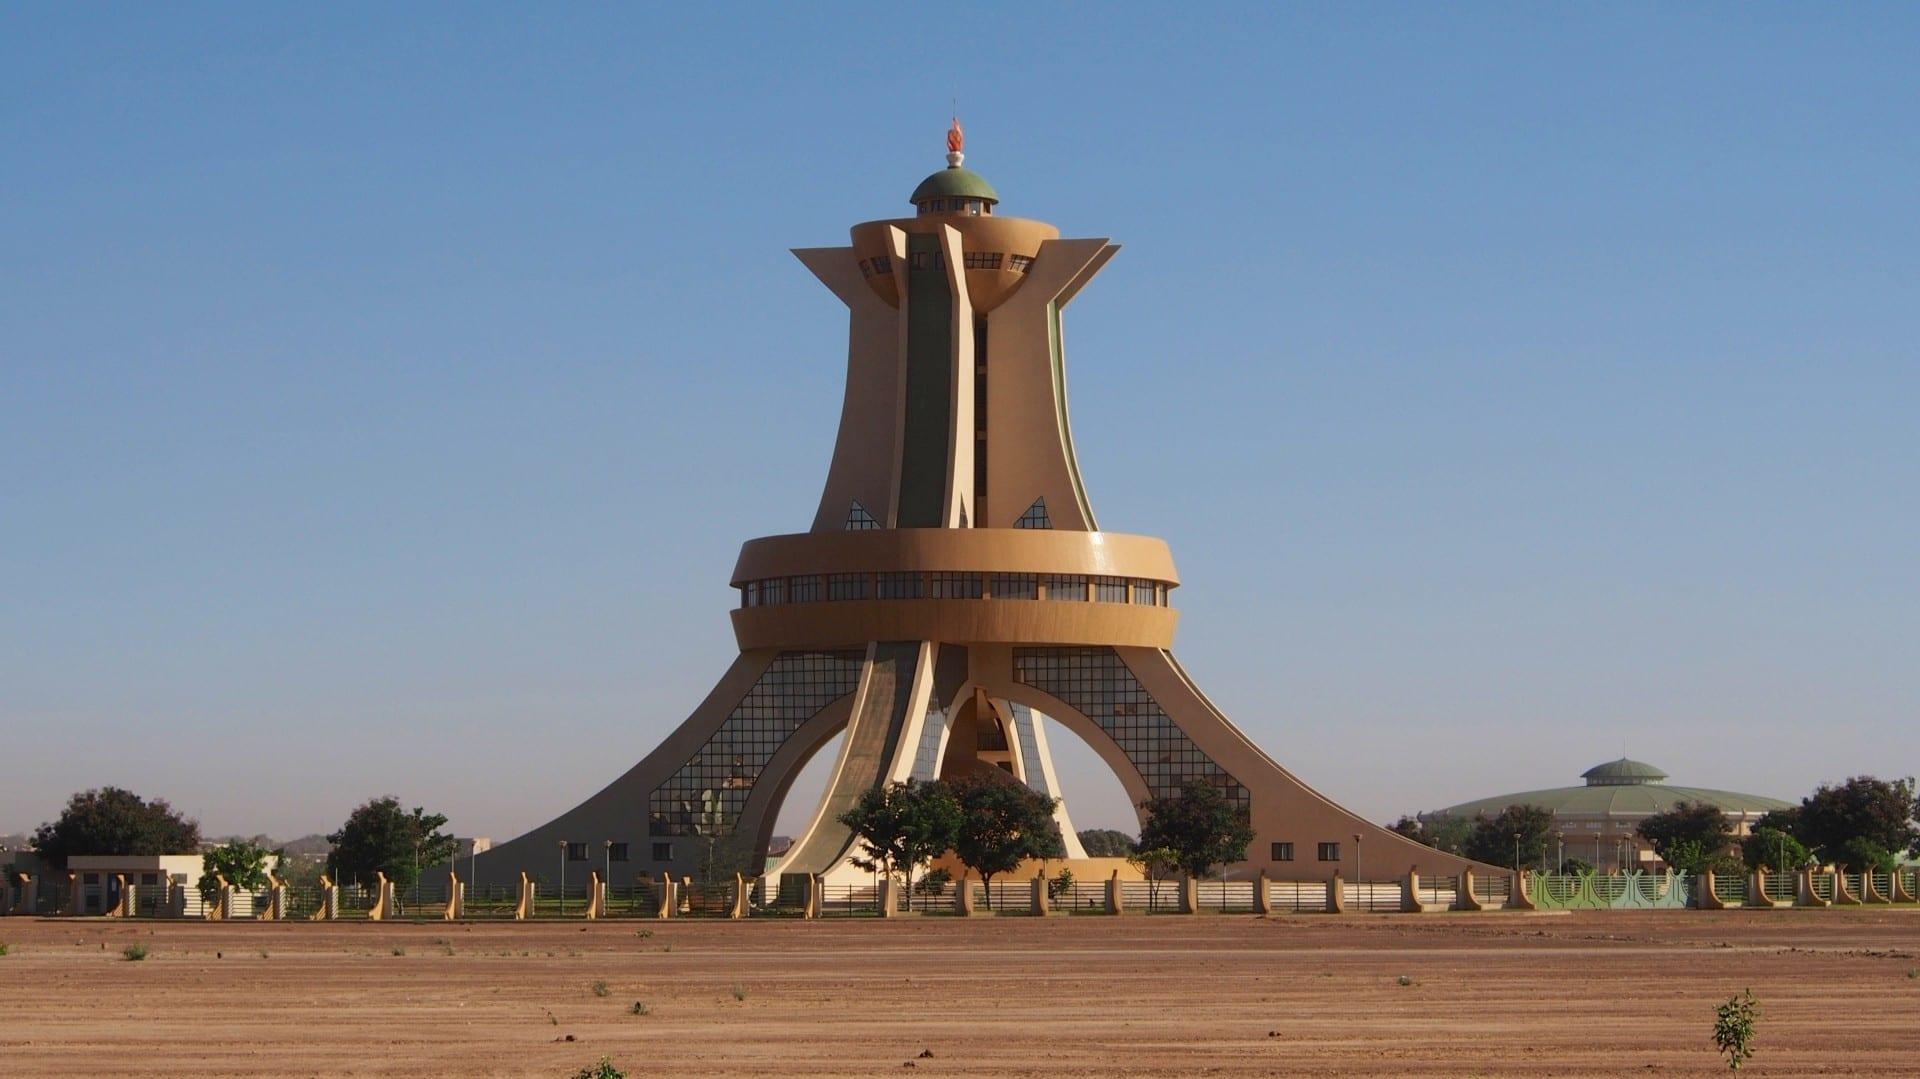 Monumento a los Mártires Uagadugú Burkina Faso